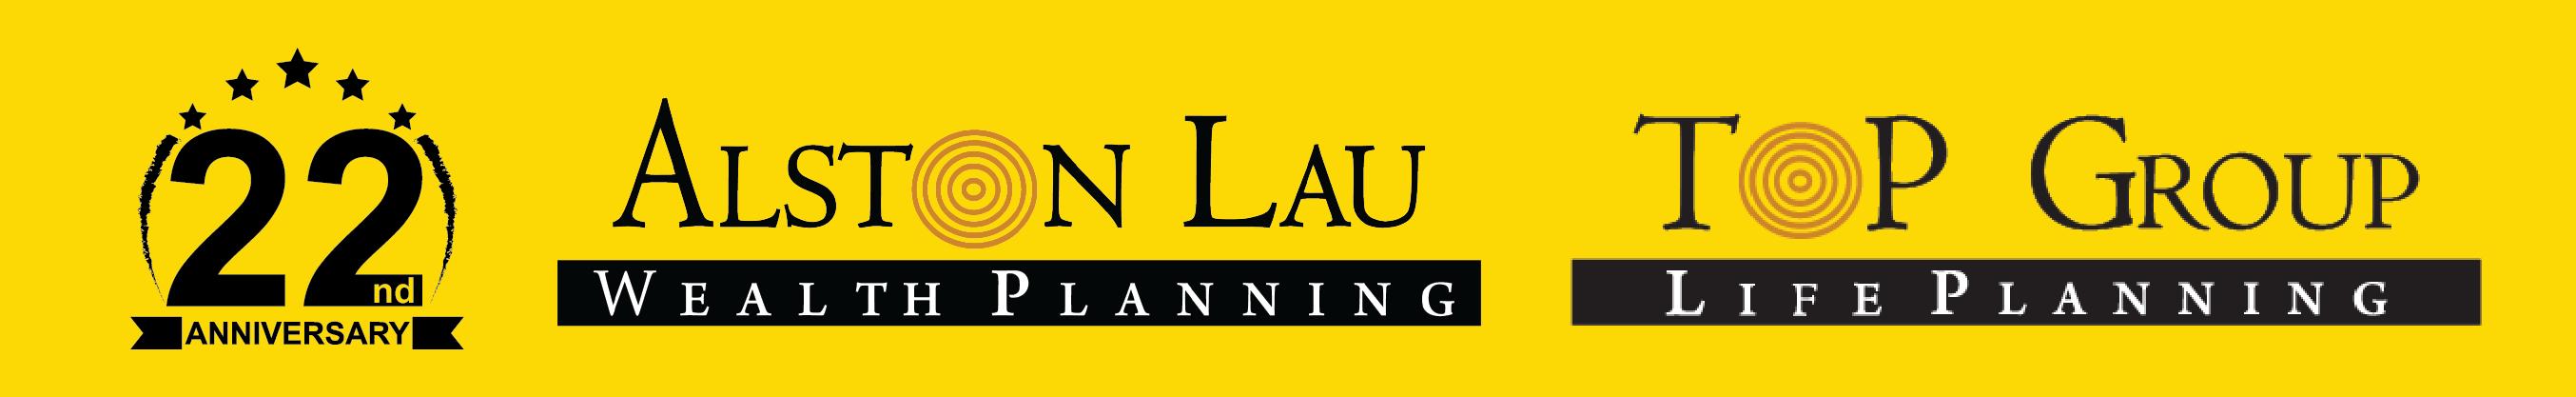 Top Group Life Planning, Alston Lau